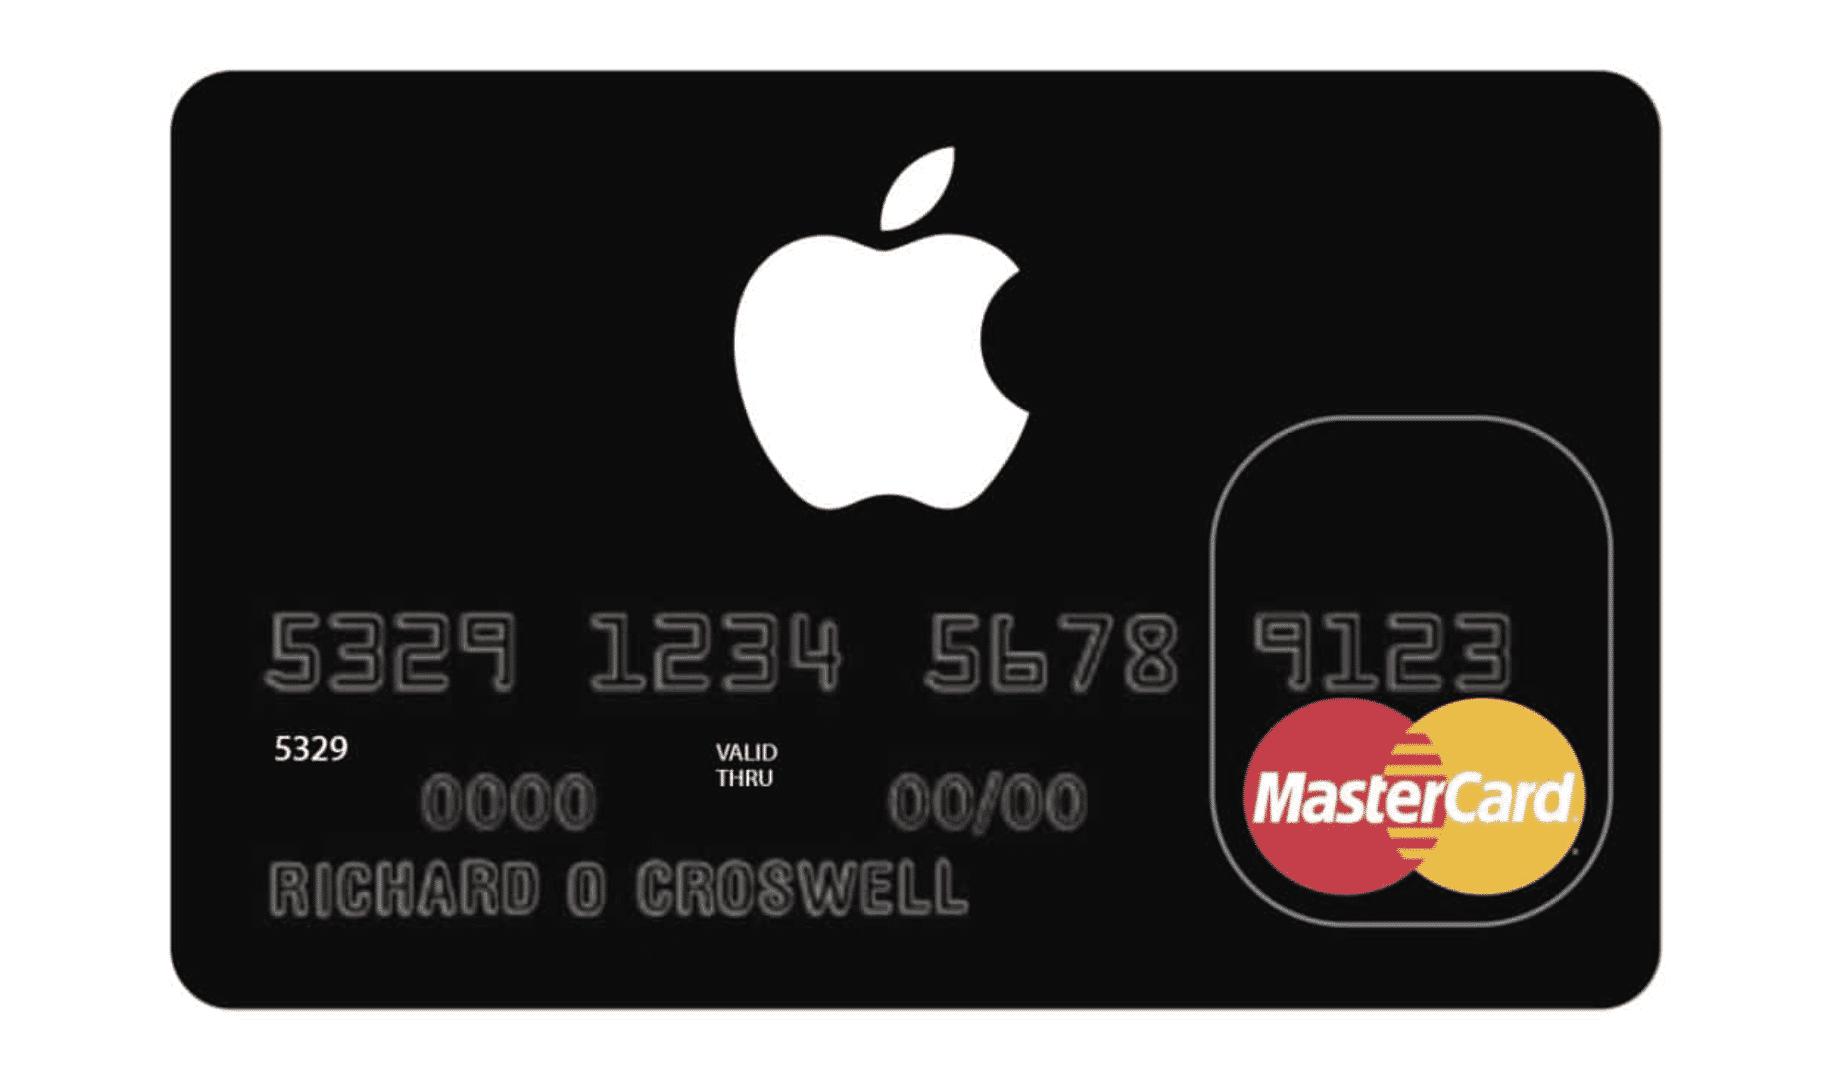 2004 Apple Credit Card